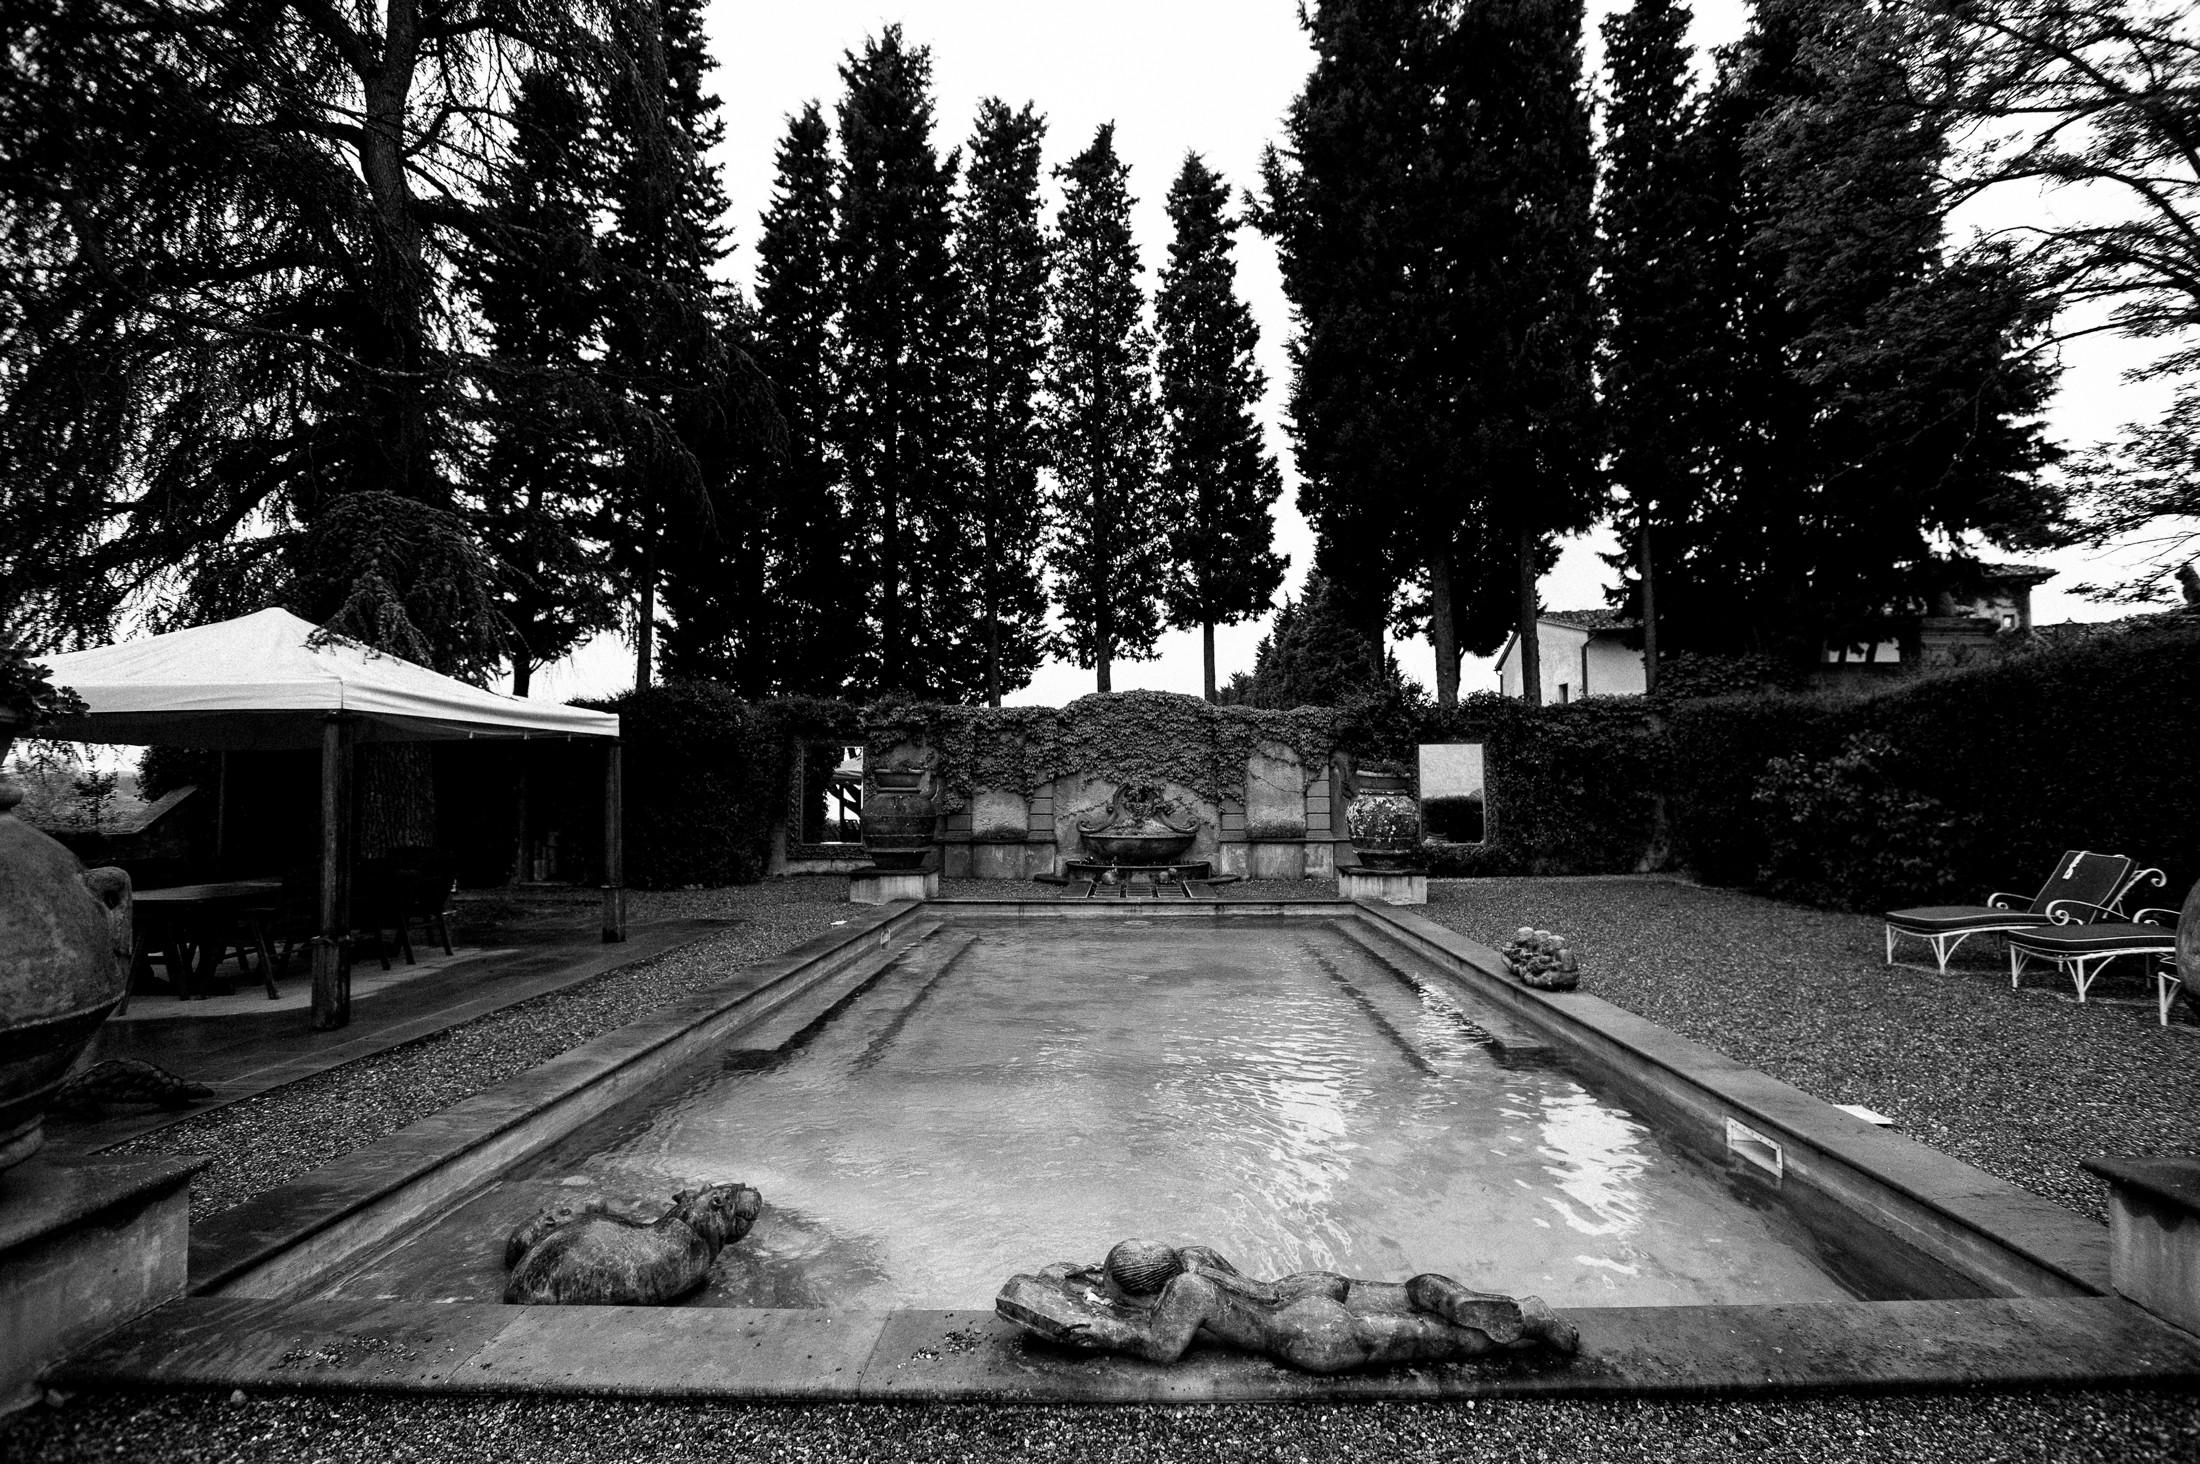 villa mangiacane firenze in black and white